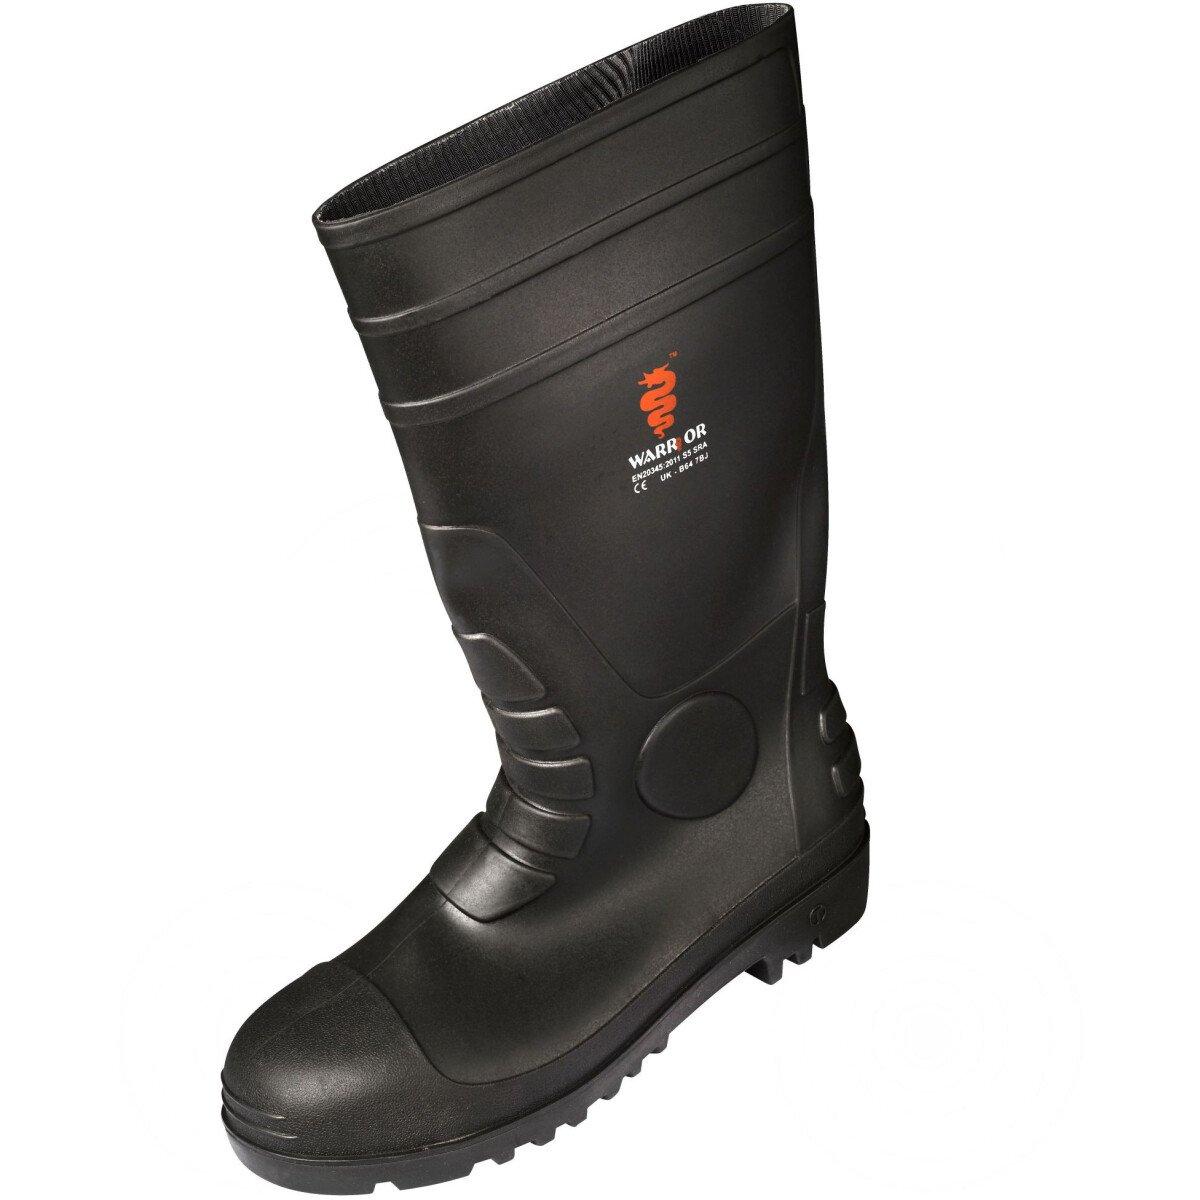 Warrior DWFO020 Safety Wellington Boot Toecap & Midsole S5 SRA UK Size 10